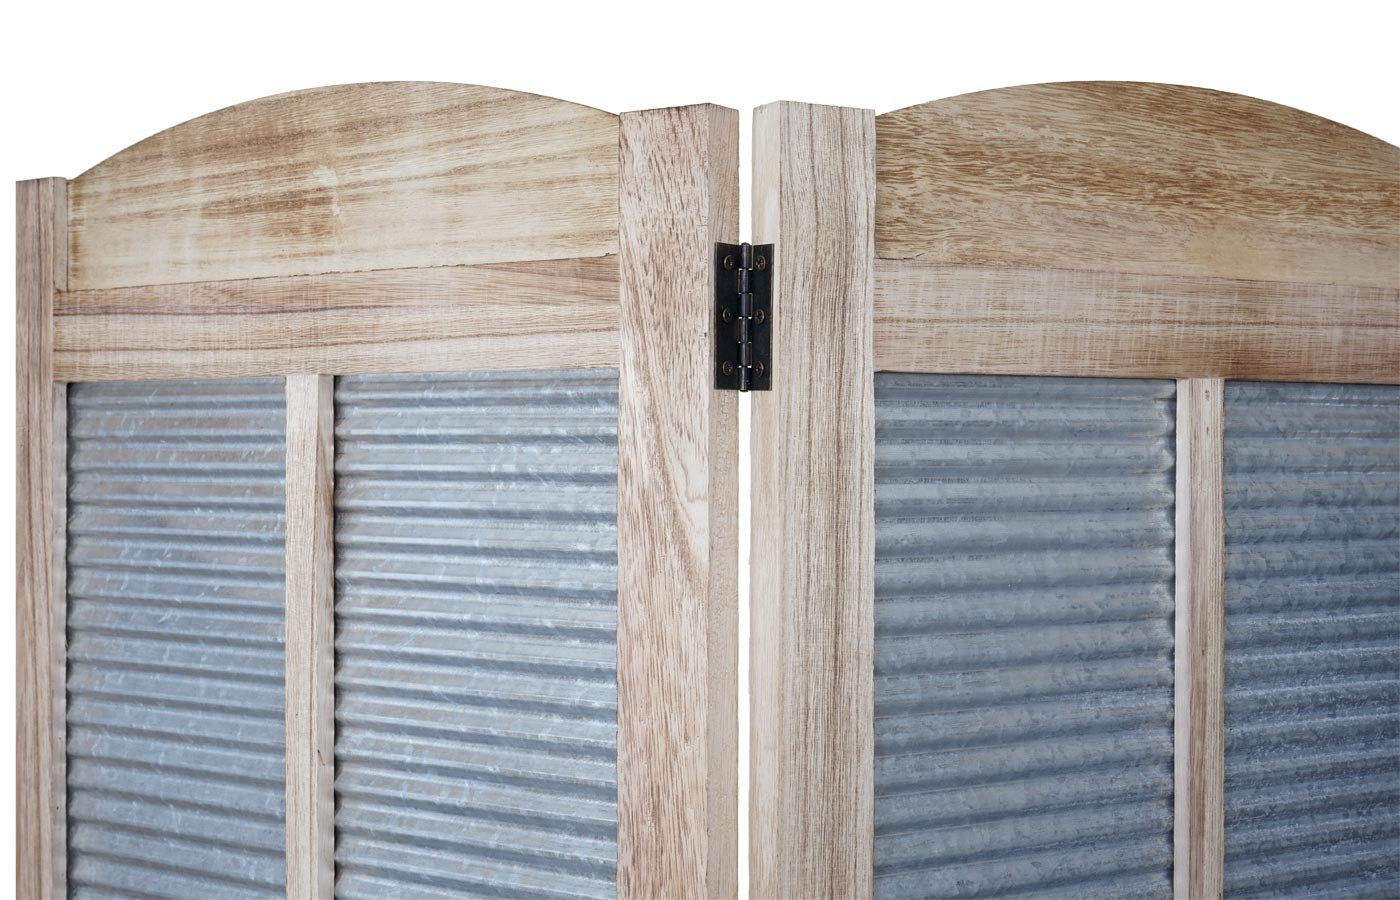 Raumteiler Trennwand Spanische Wand Sichtschutz Holz Metall 170x161x29cm Mendler Paravent Hwc D26 Pflanzkorbe